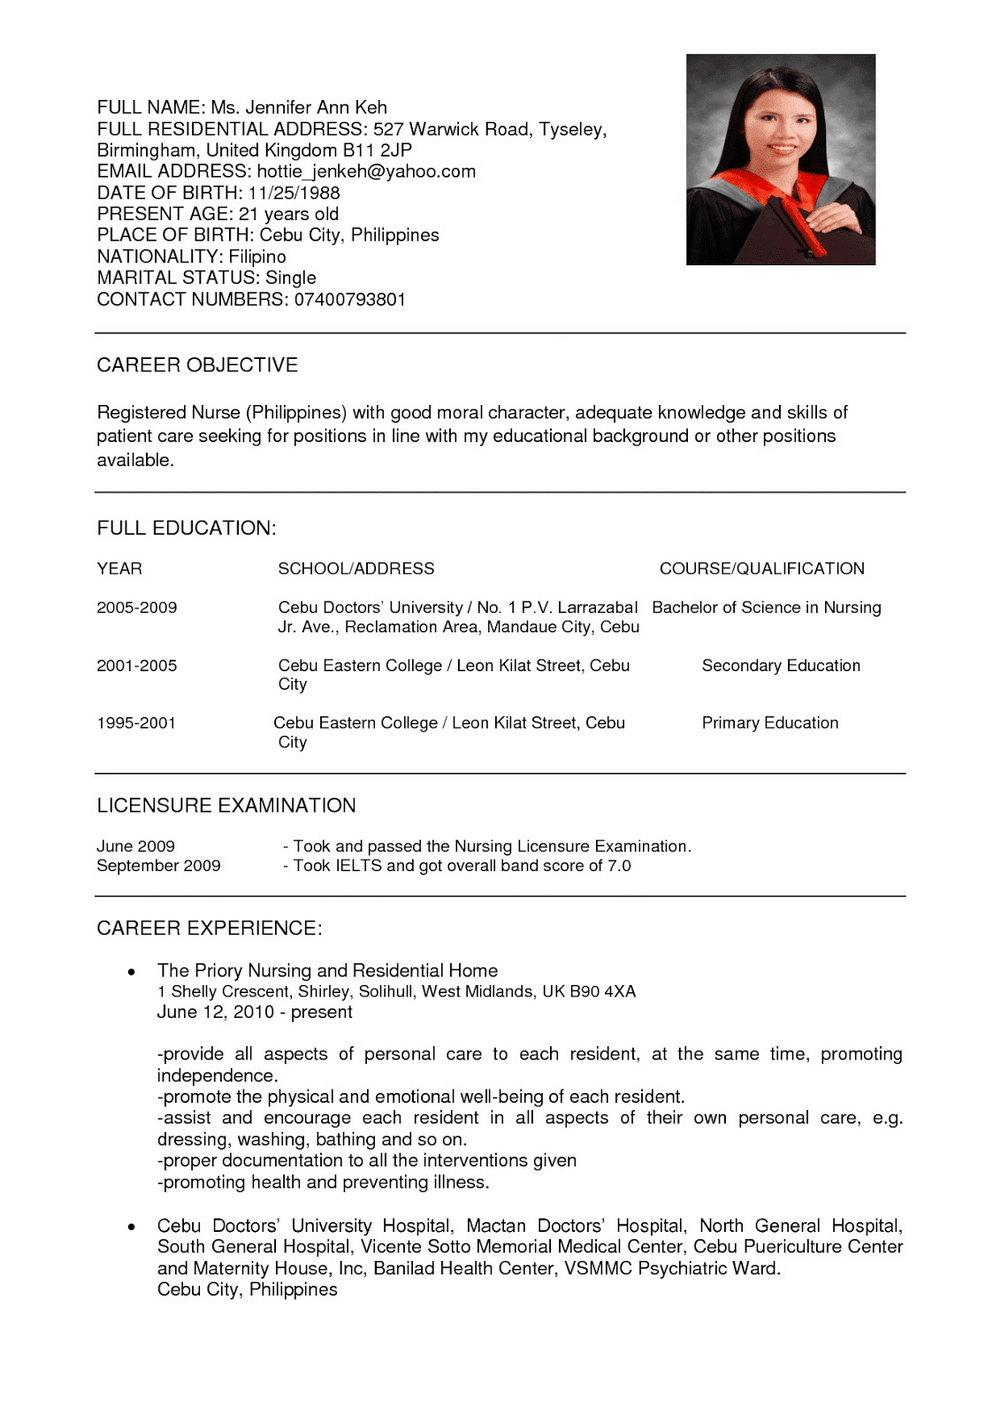 Registered Nurse Resume Template Canada